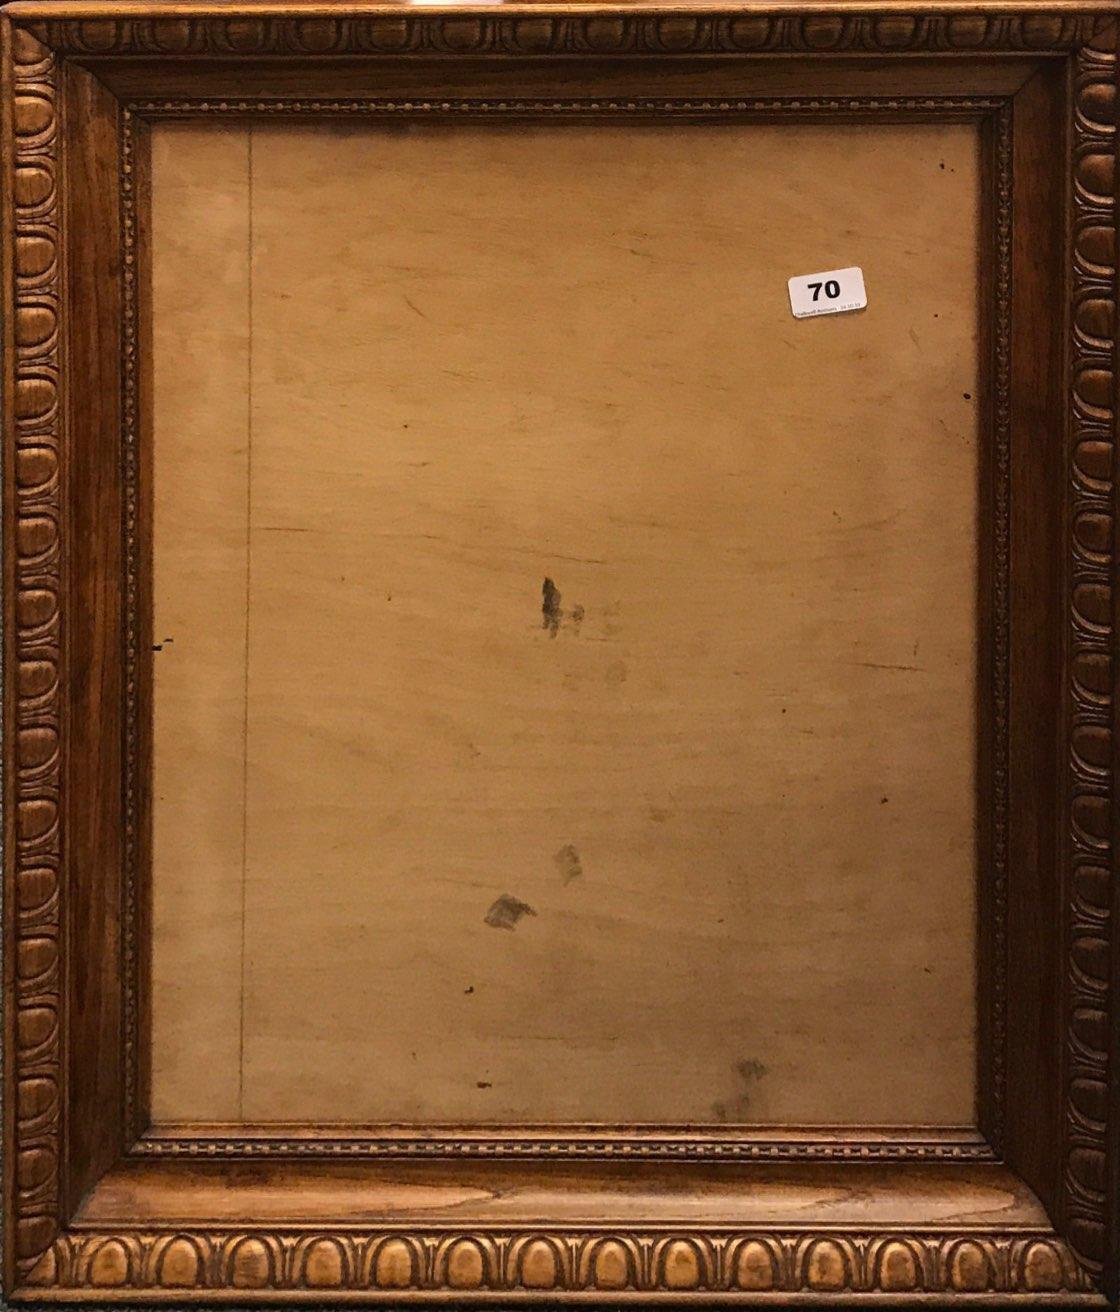 Lot 70 - A useful carved probably 1920's carved oak picture frame, framed size 56 x 66cm.